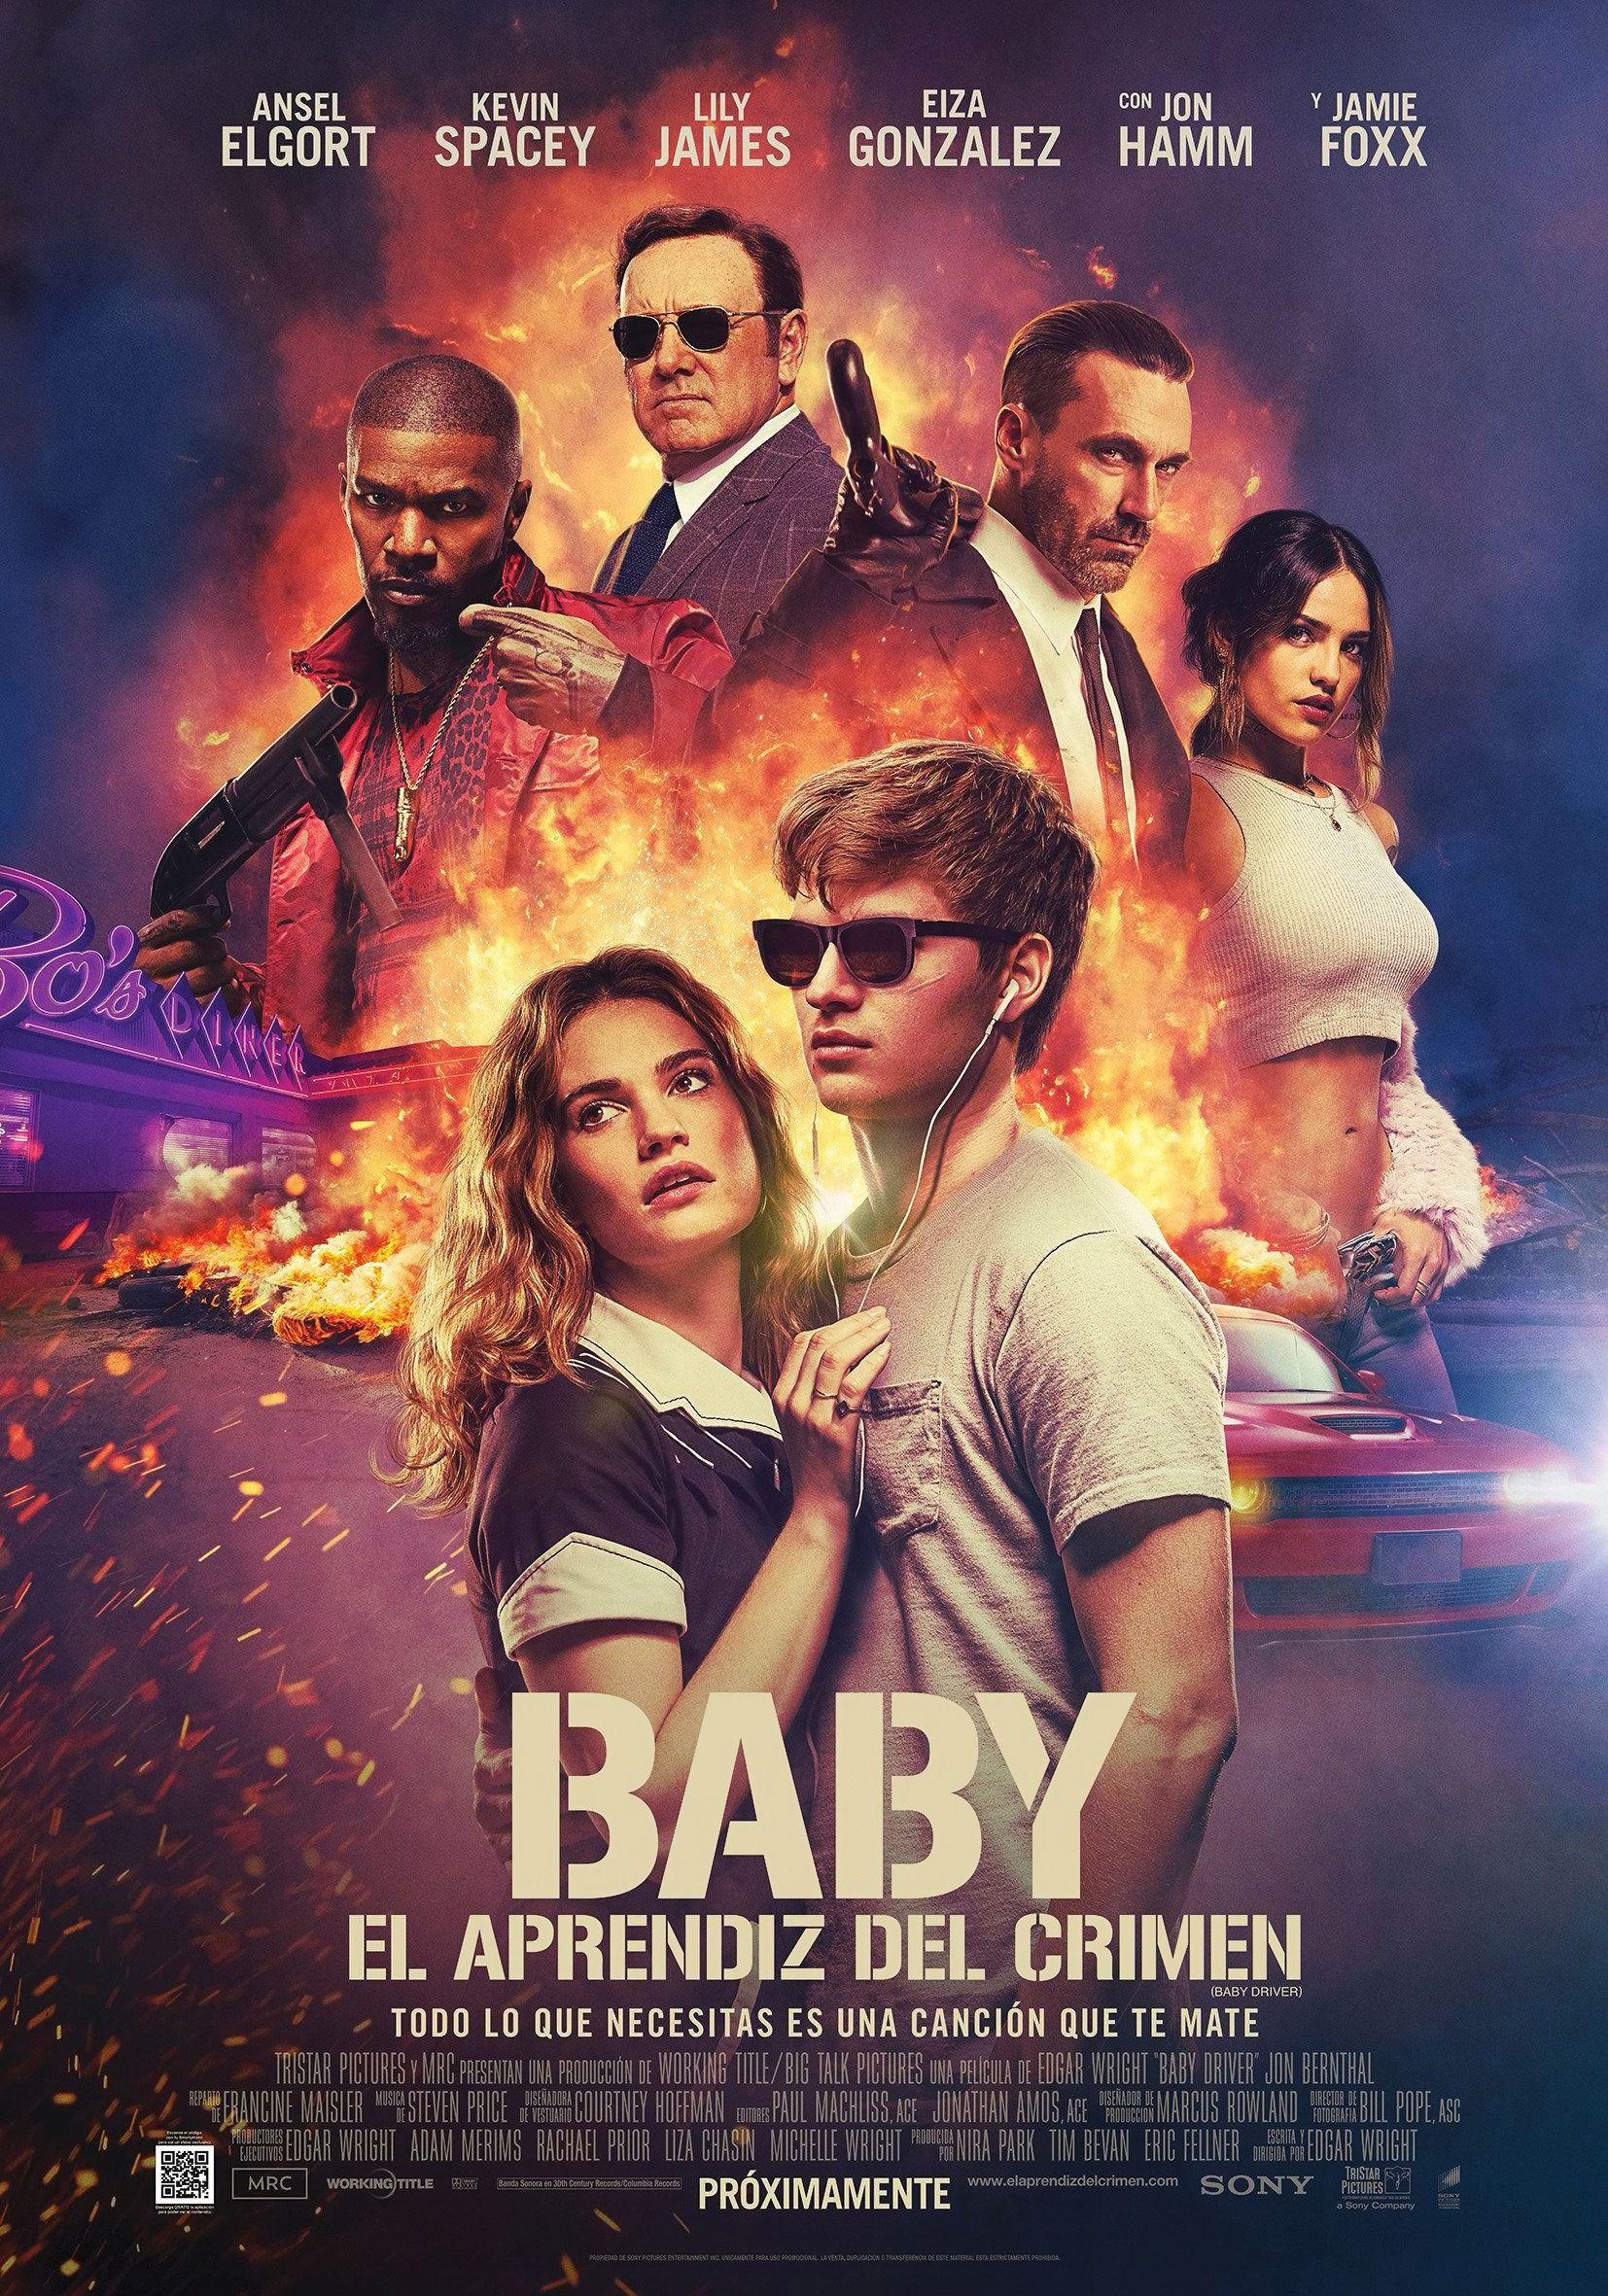 Baby Driver 2017 Hd Wallpaper From Gallsource Com Polnometrazhnye Filmy Ensel Elgort Filmy Hd